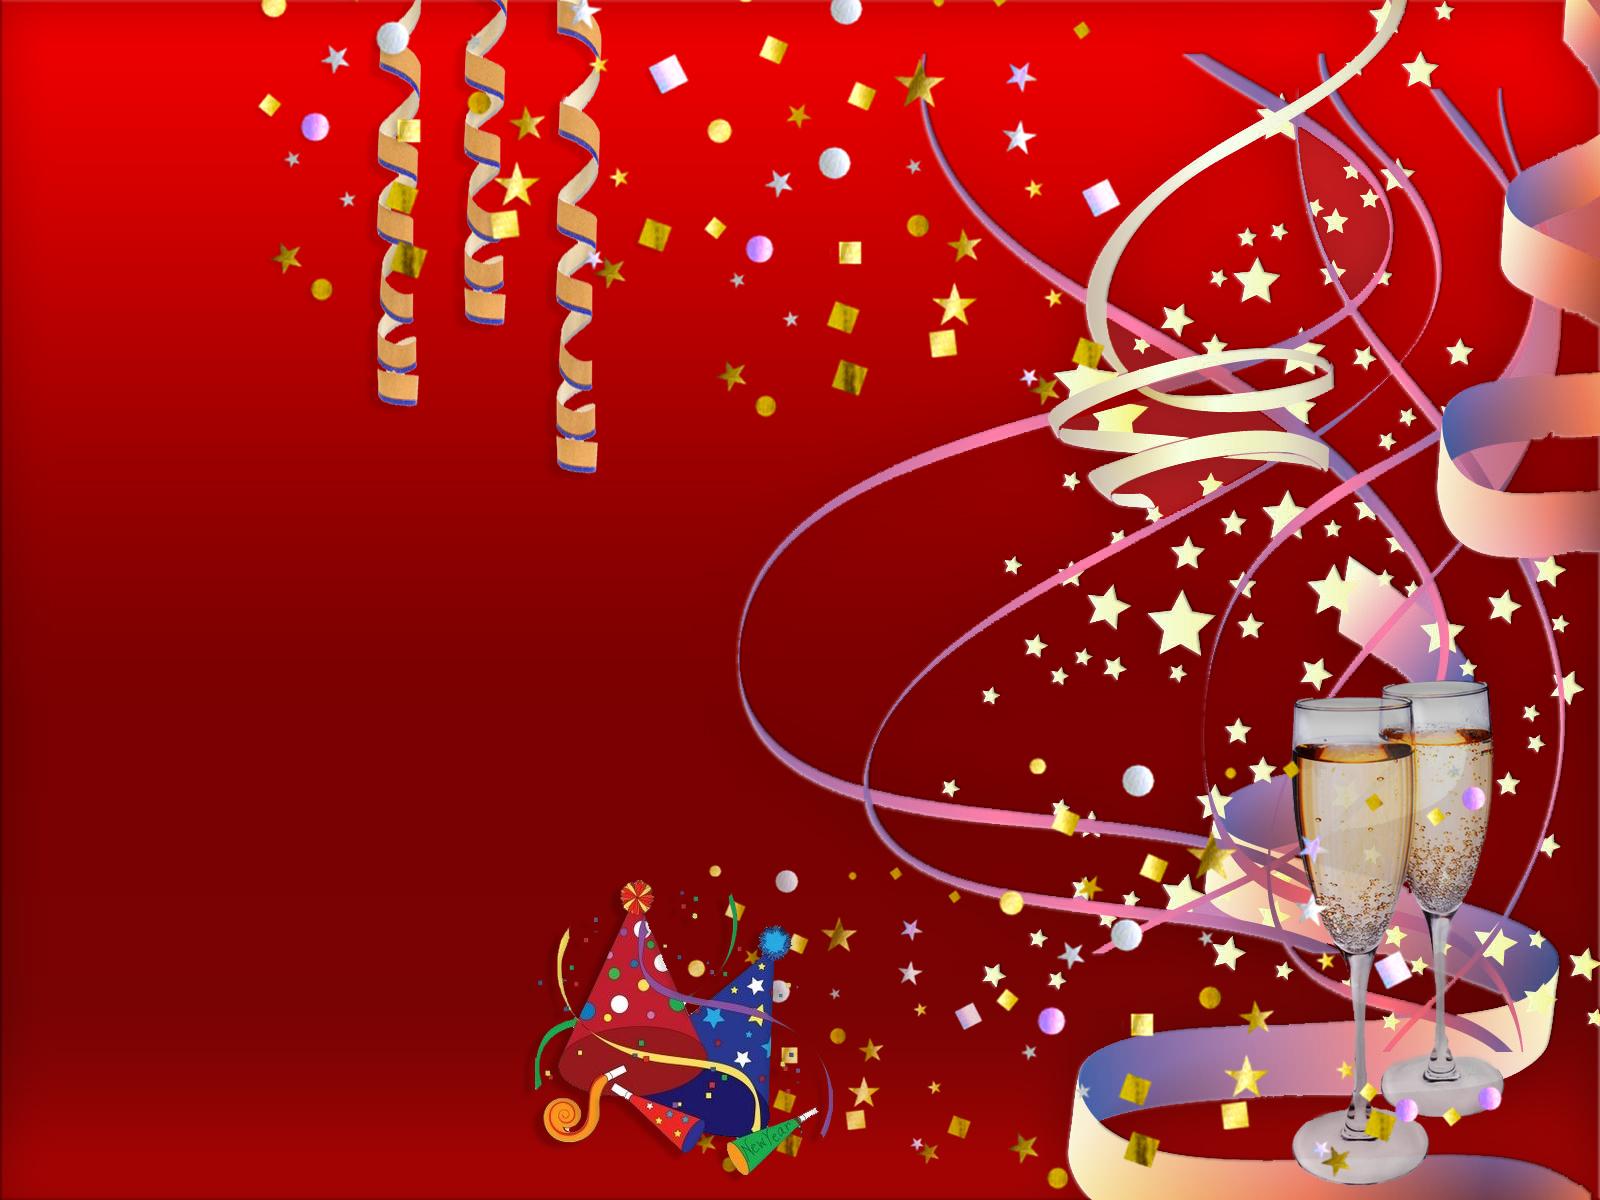 2012 Wallpaper HD New Years Wallpaper 1600x1200